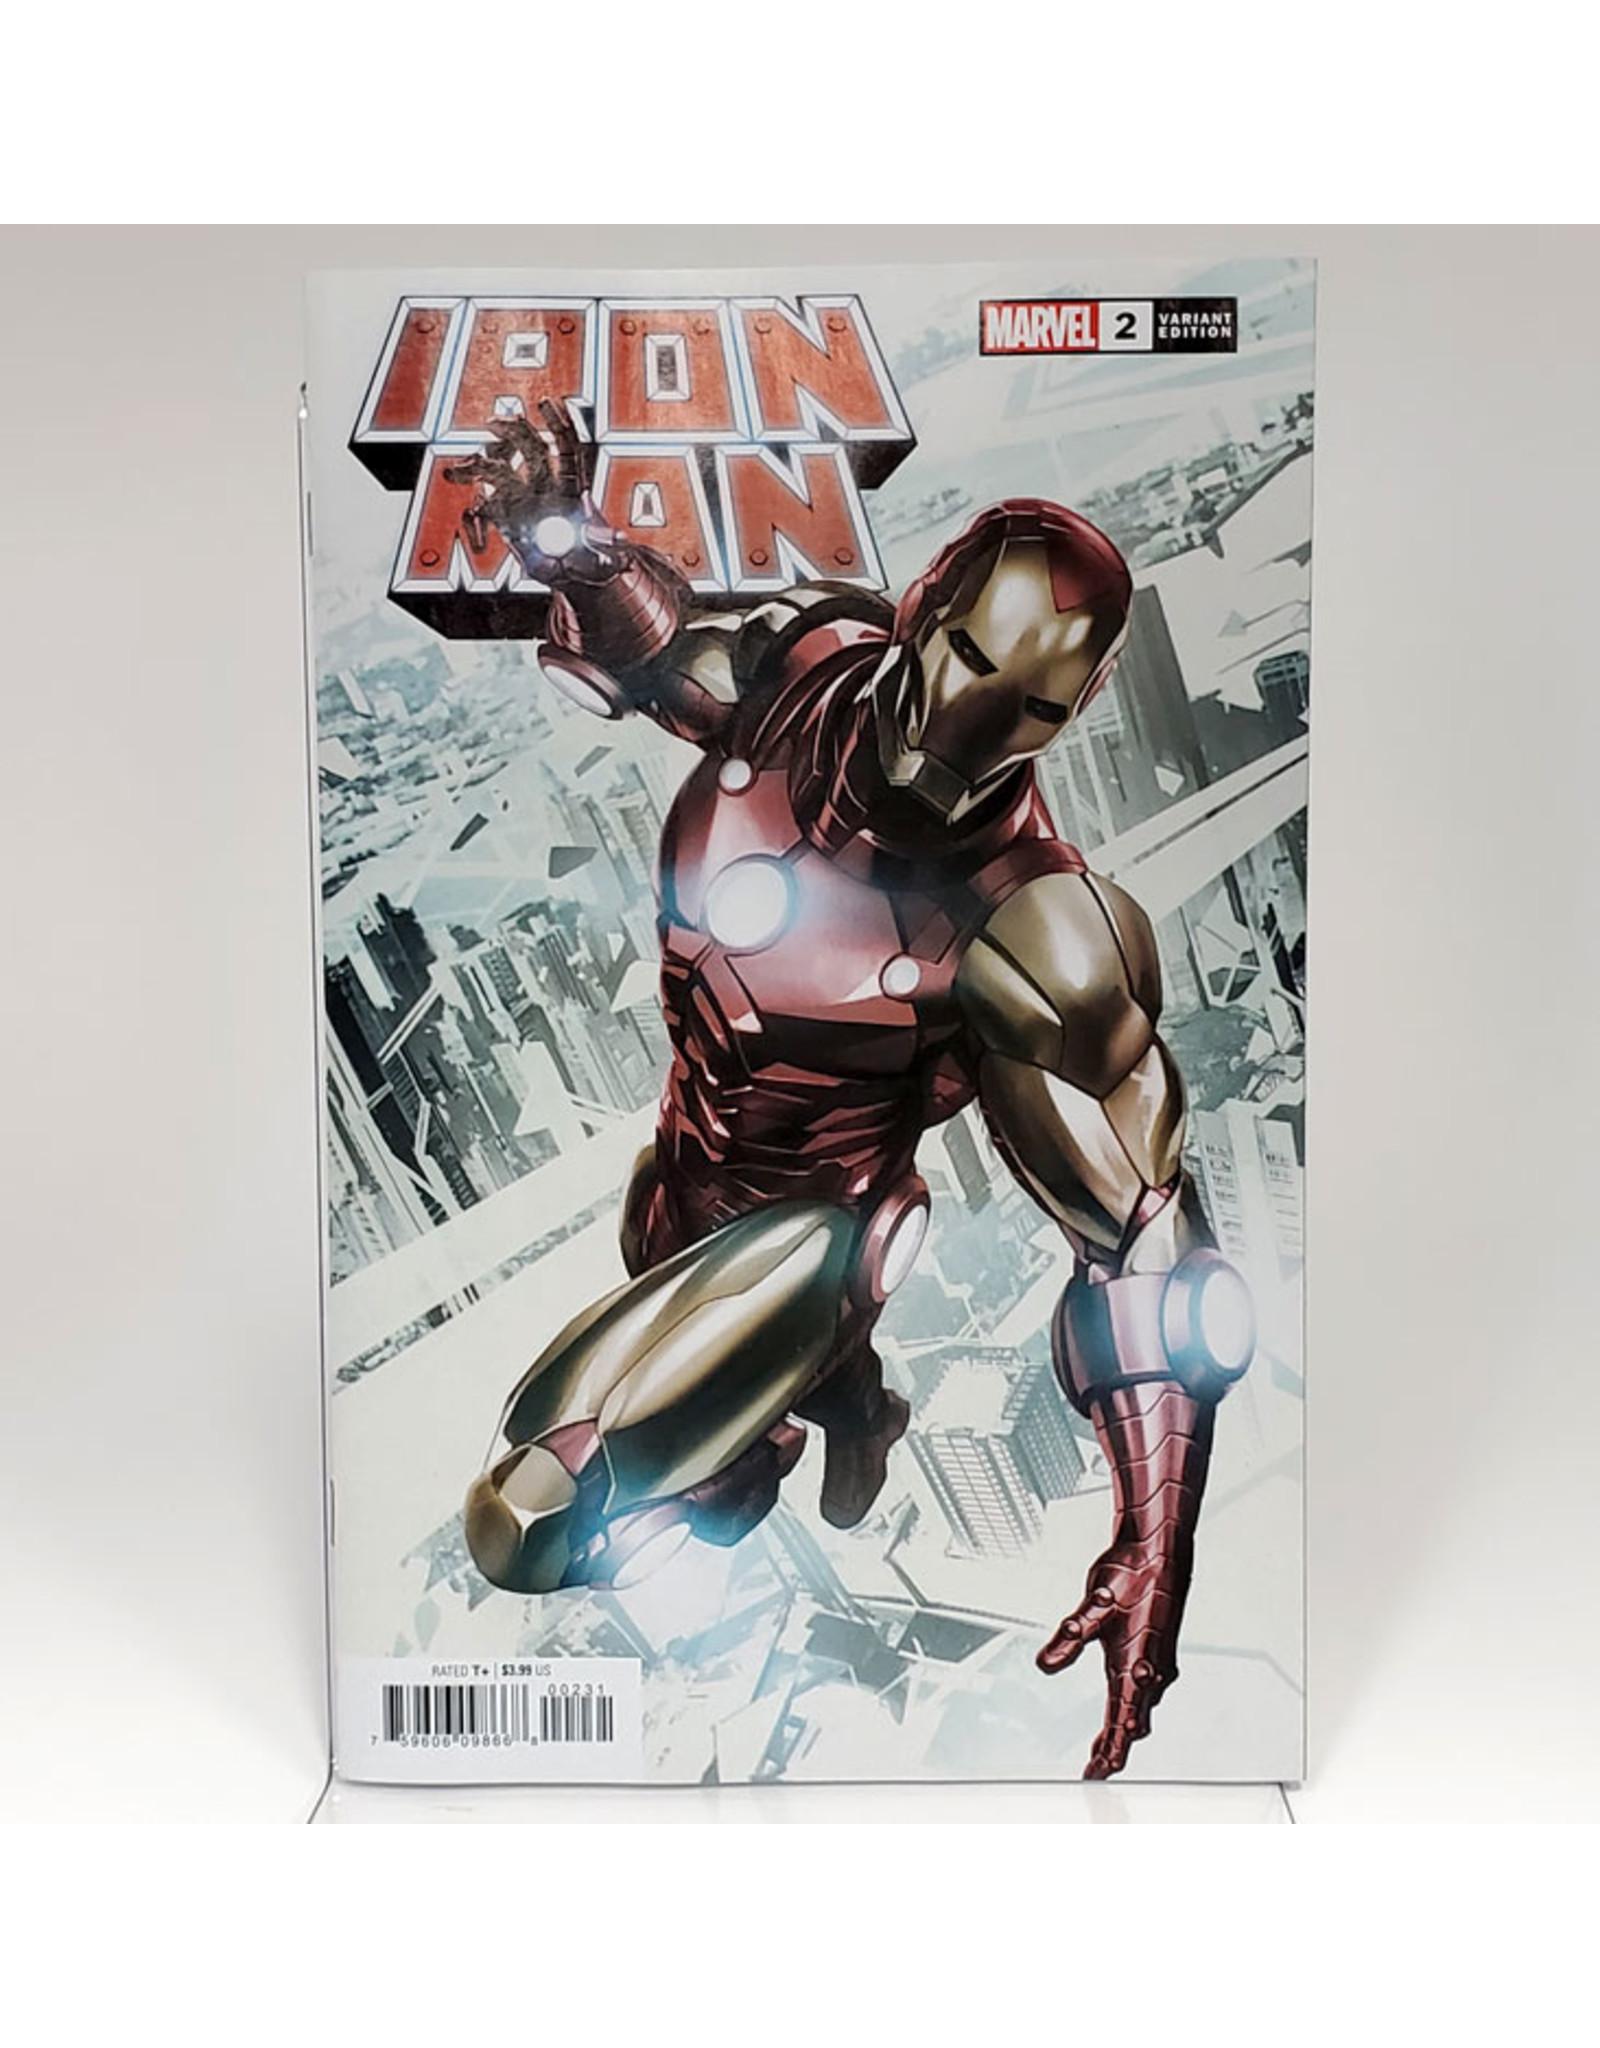 MARVEL COMICS IRON MAN #2 1:25 SKAN VAR